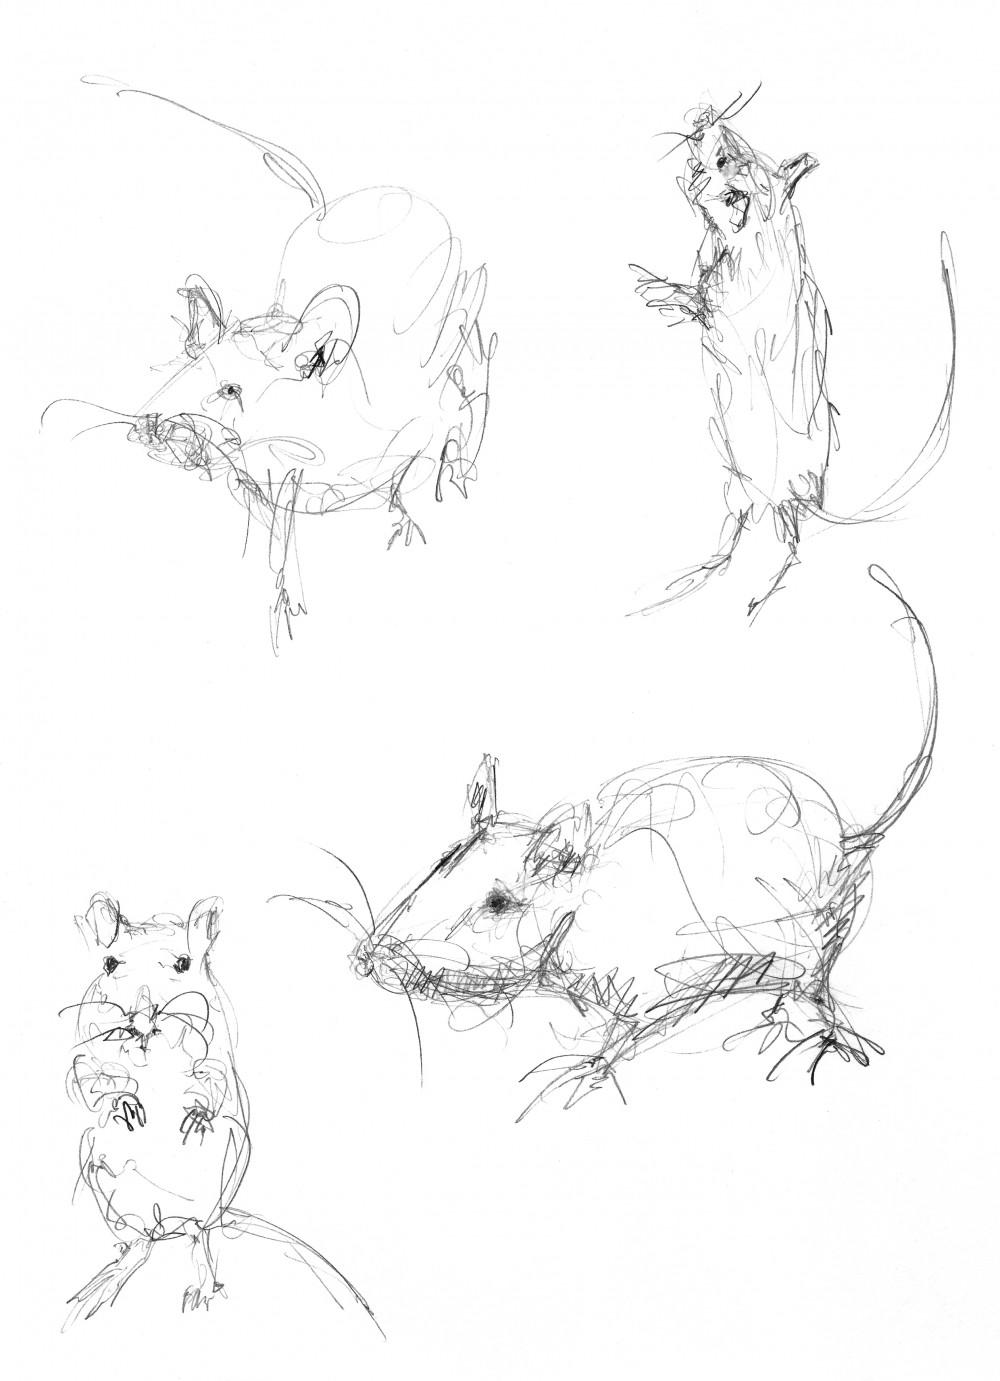 Four mice drawn by Julie Béna